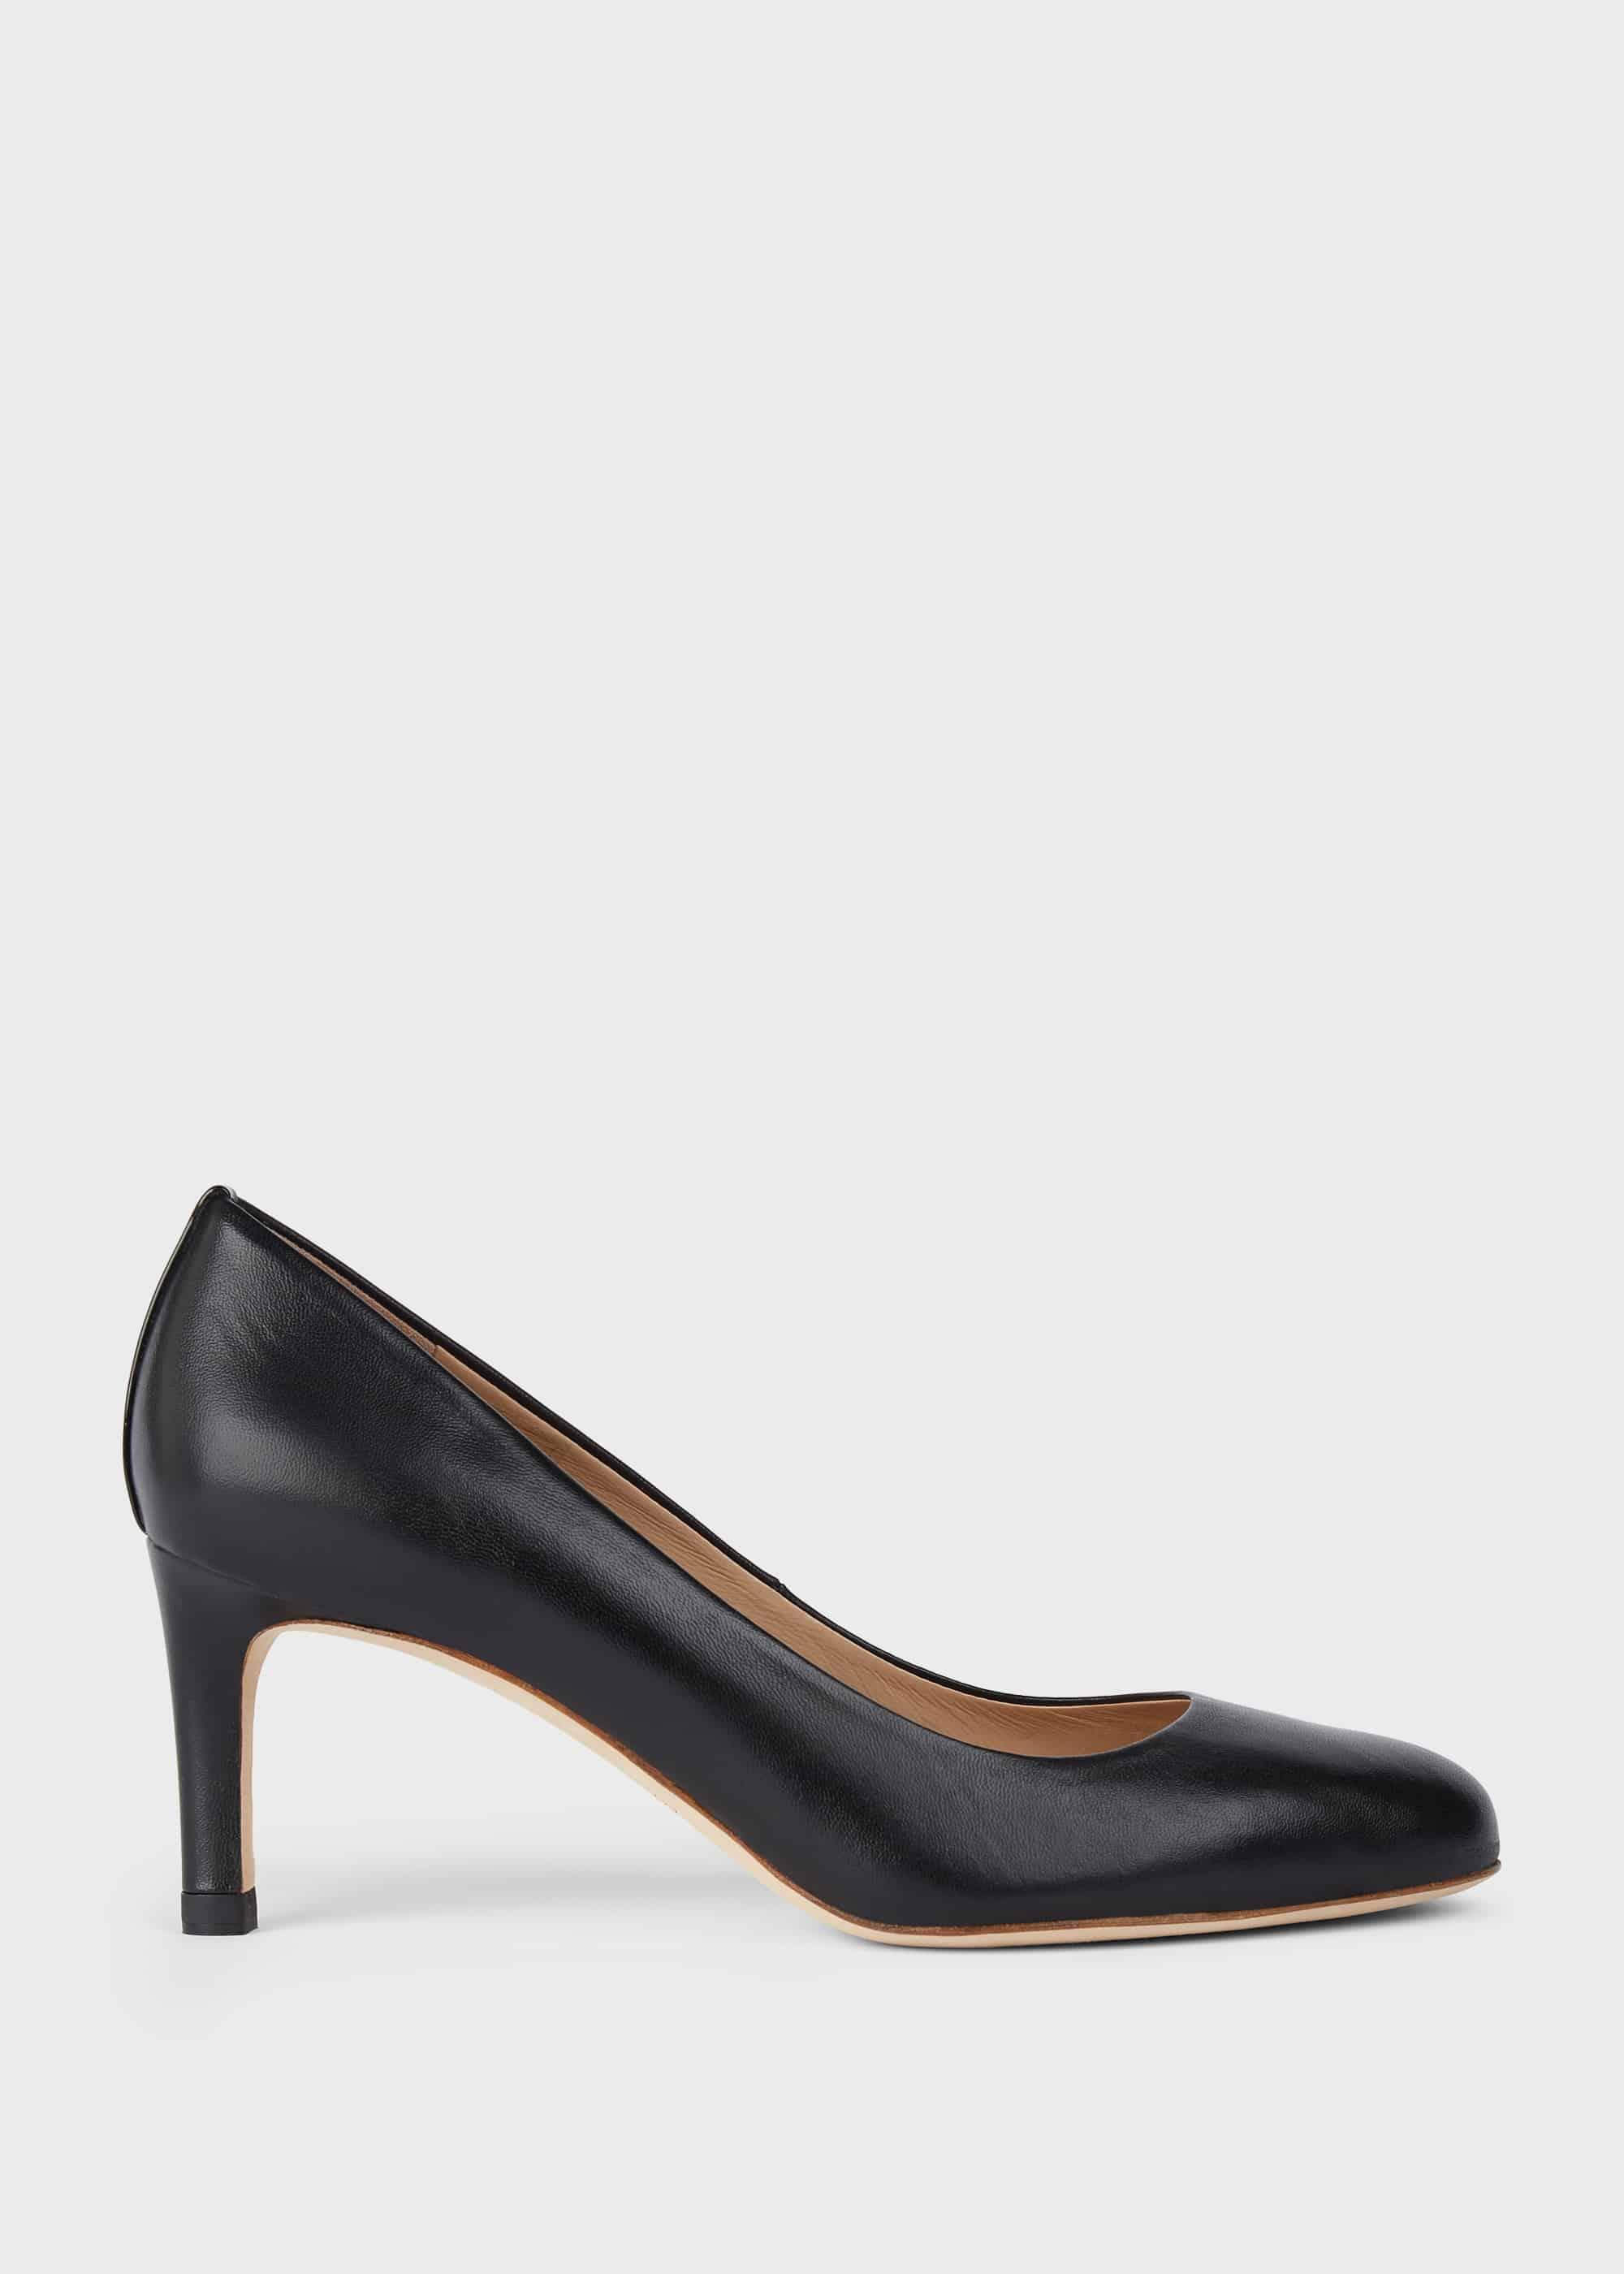 Hobbs Women Lizzie Leather Stiletto Court Shoes